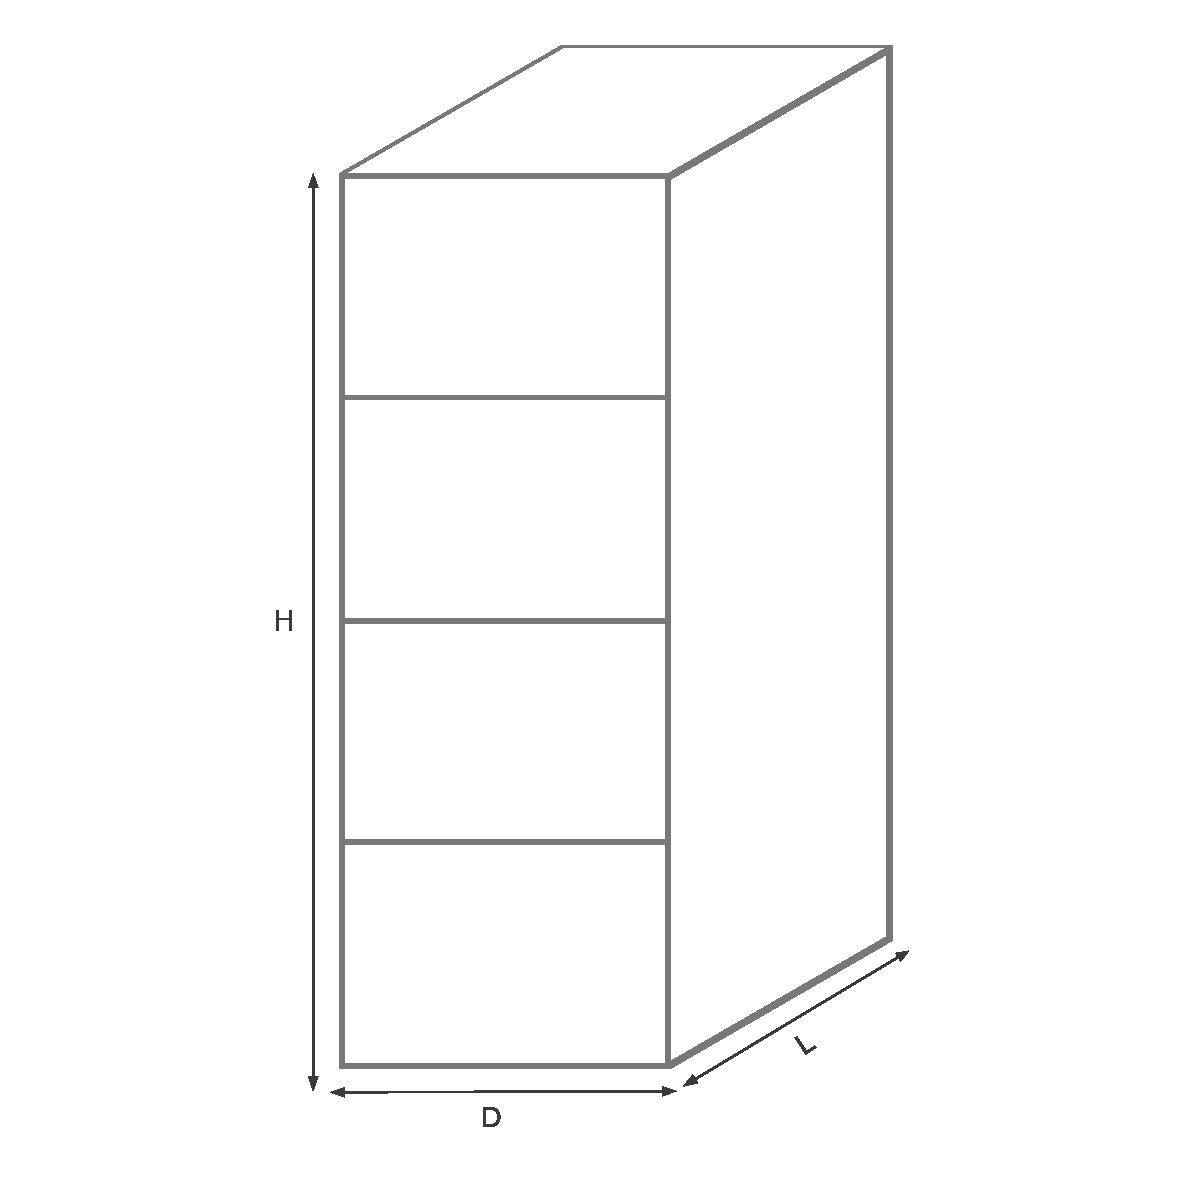 فایل 4 کشو معمولی 600FR تک رمز مکانیکی